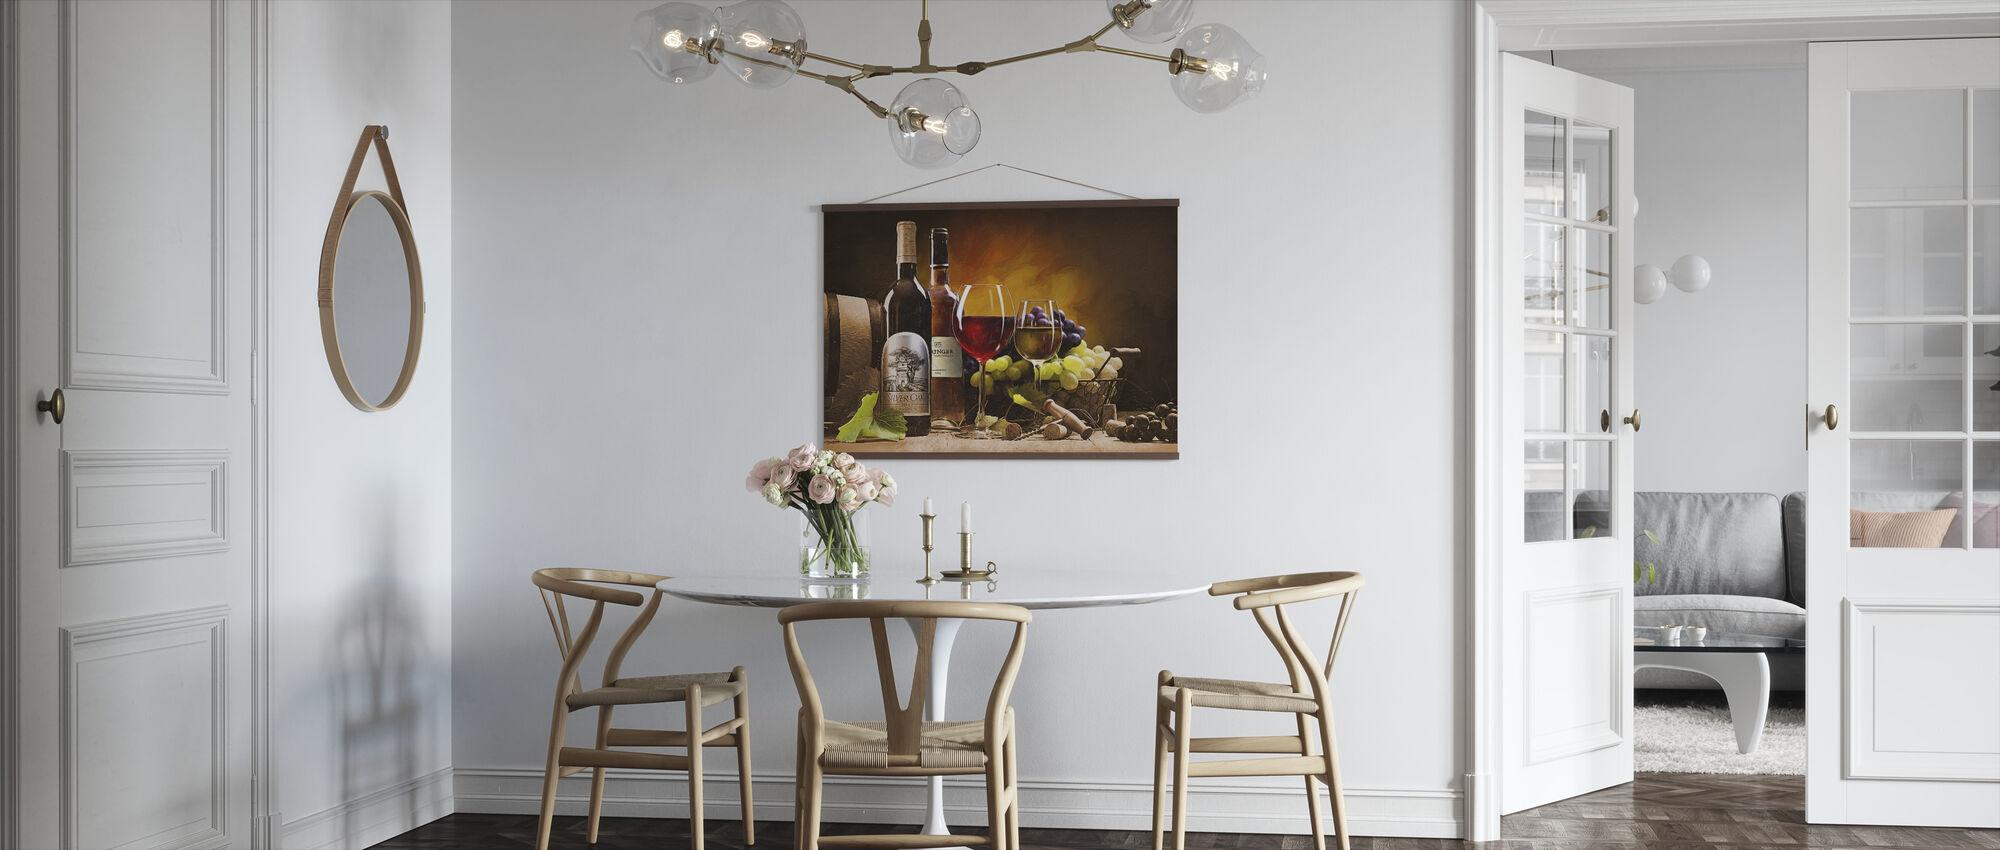 A Taste of Napa Valley - Poster - Kitchen